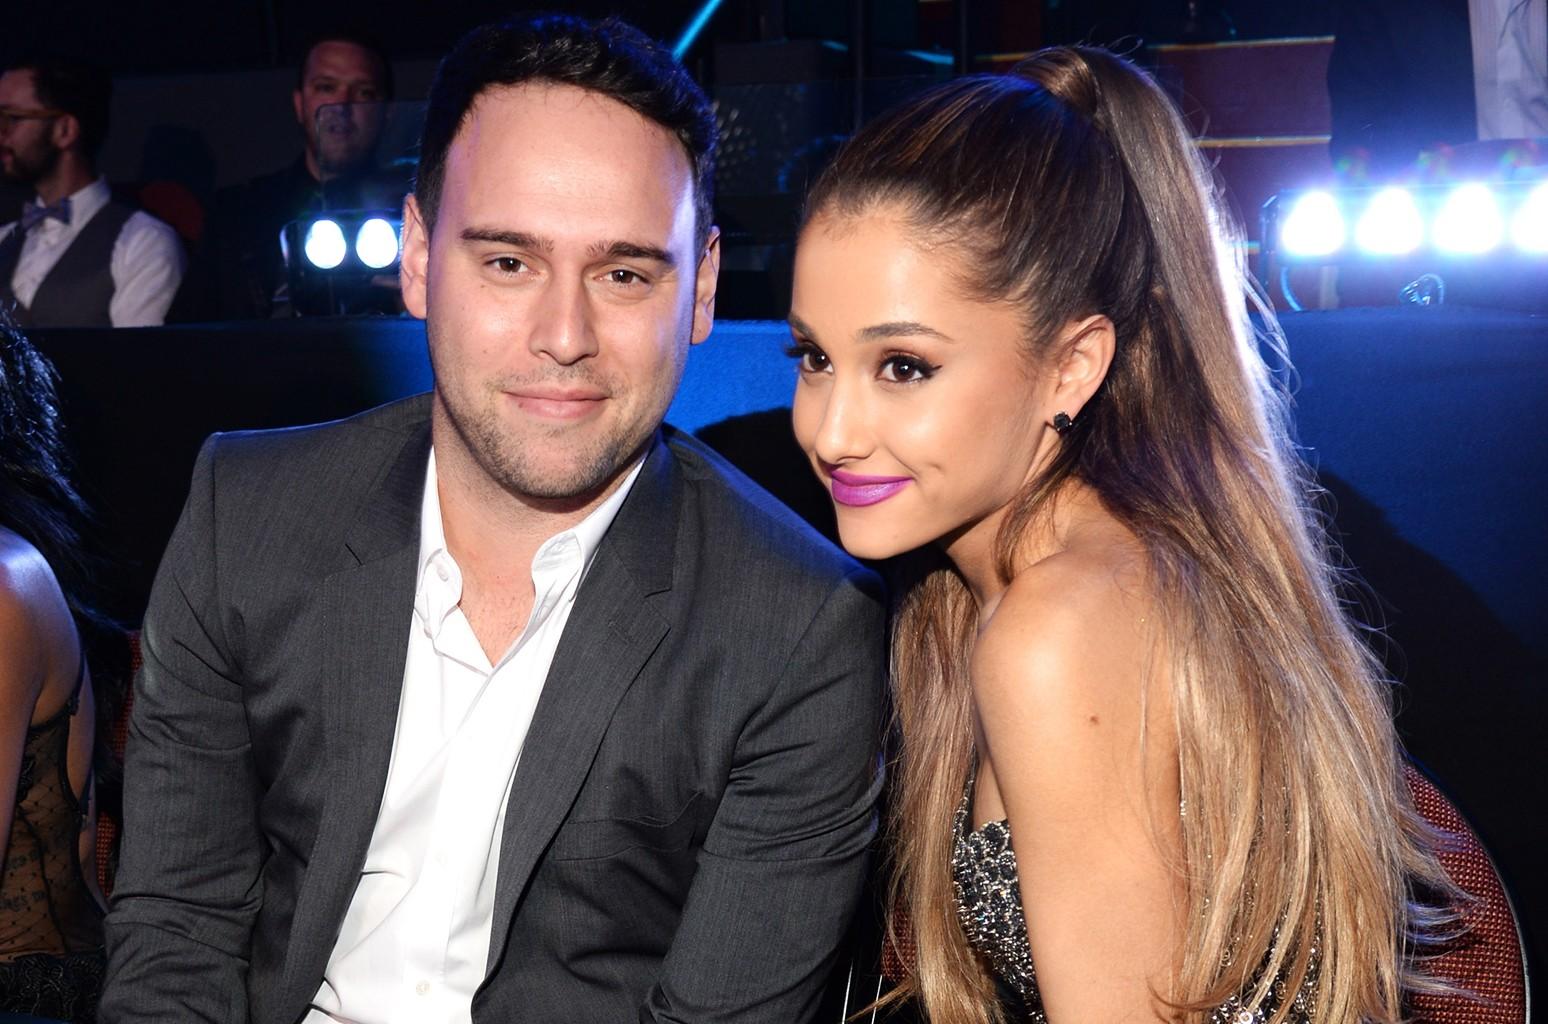 Scooter Braun and Ariana Grande